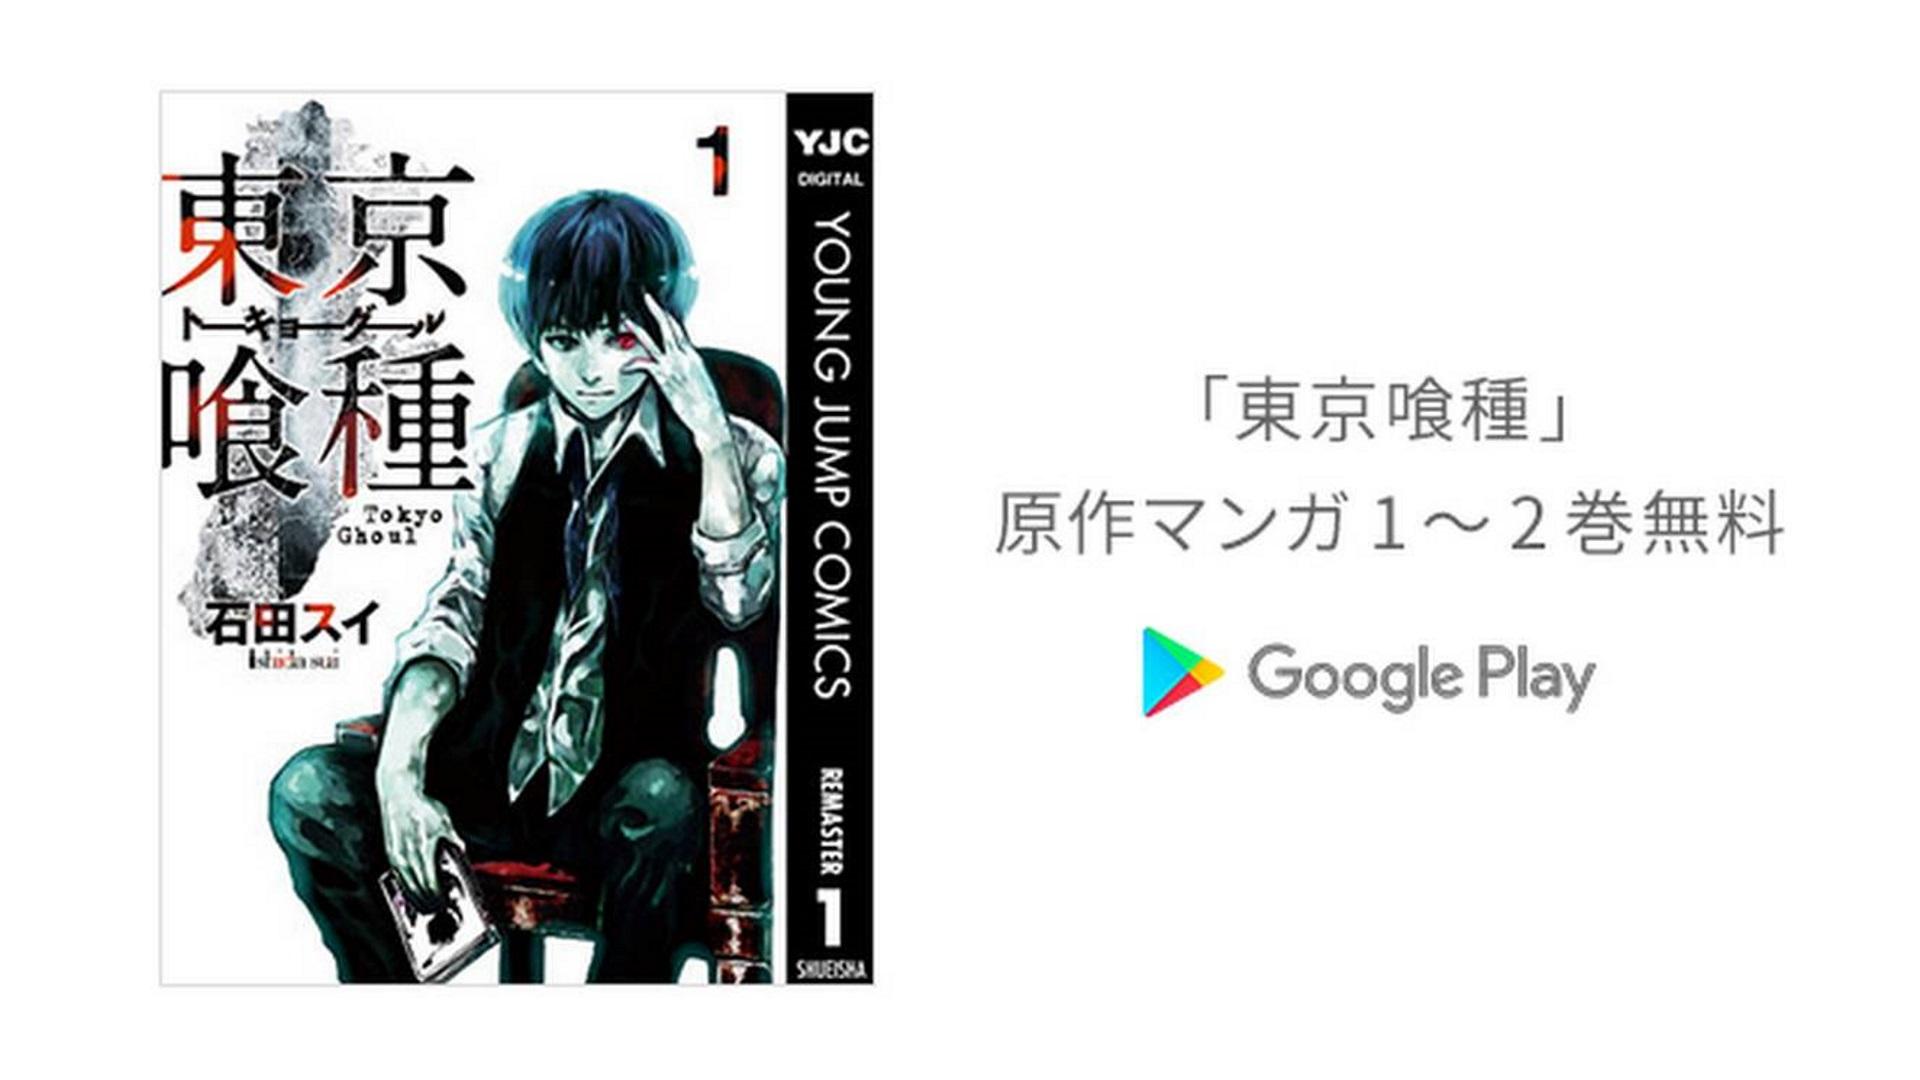 Google Play「東京喰種」1~2巻を無料配信、8月3日まで